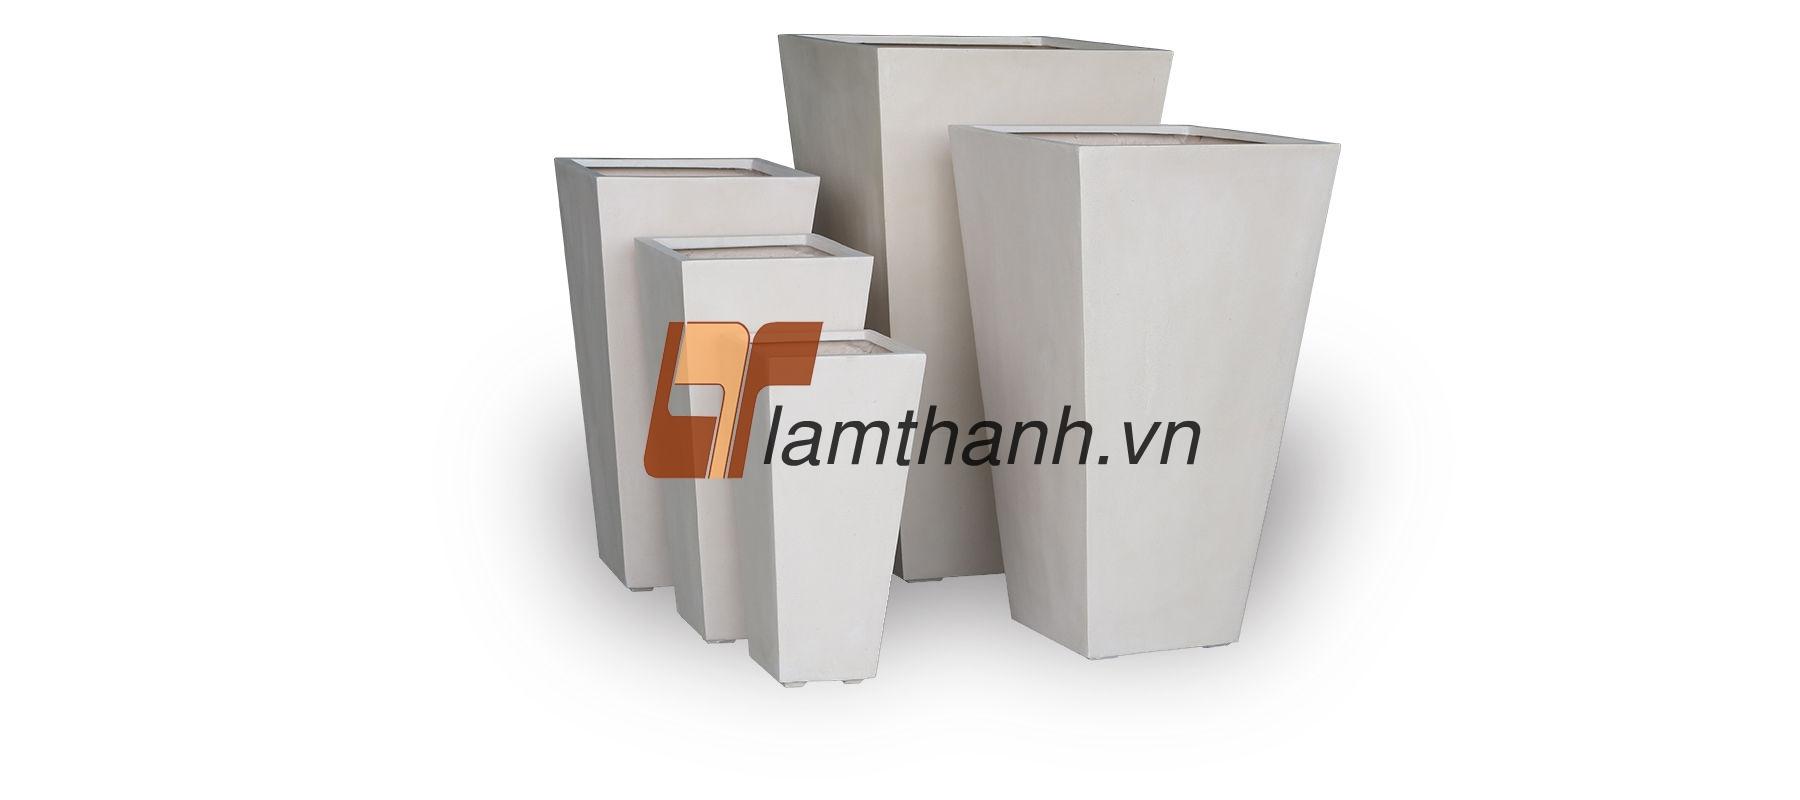 vietnam polystone, fiberstone 10